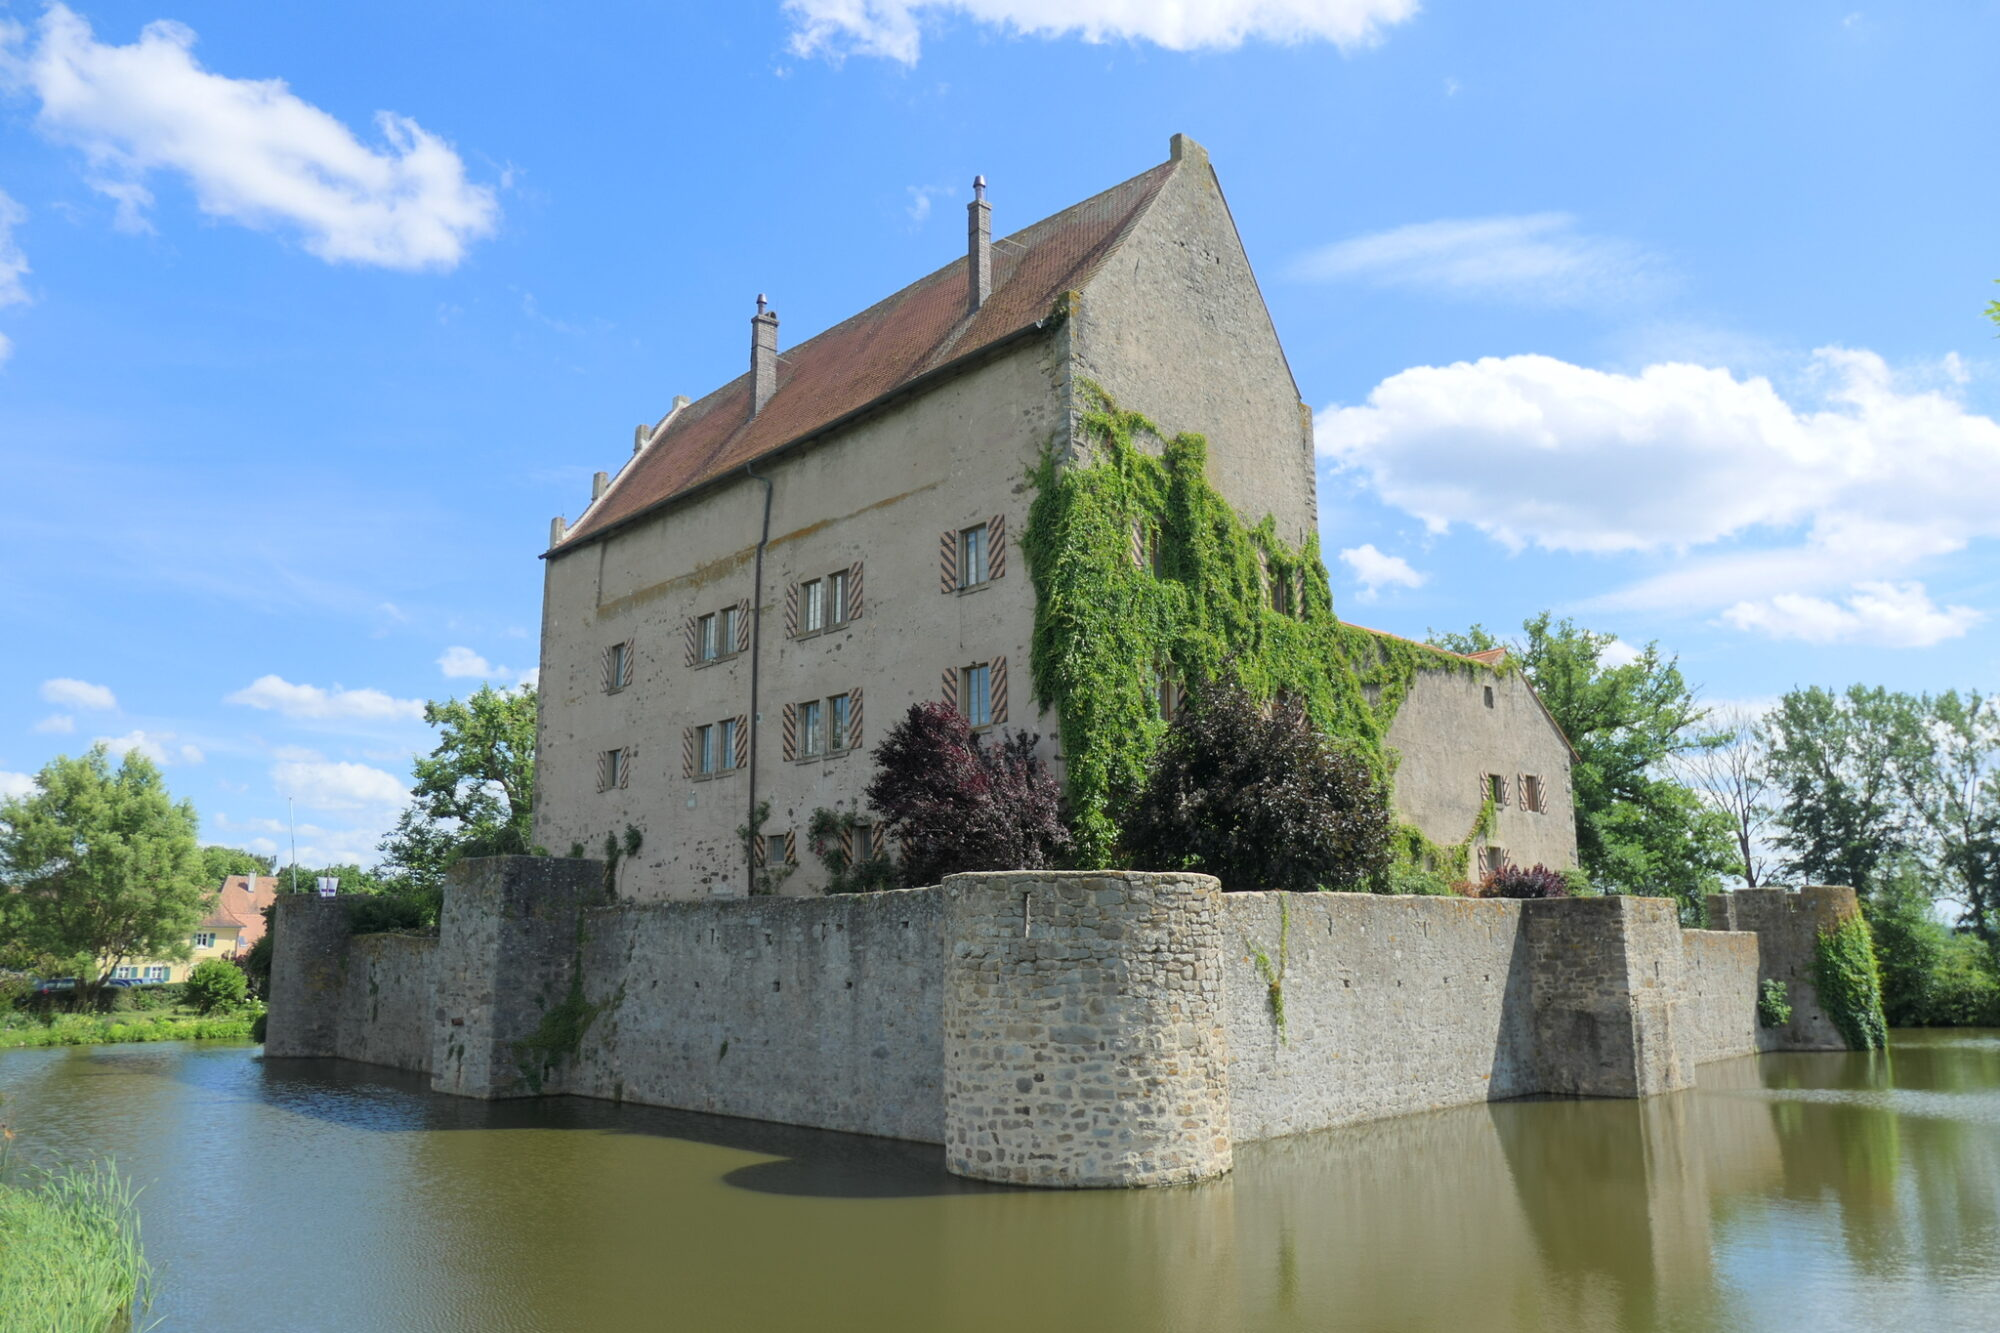 Moat of castle Sommersdorf